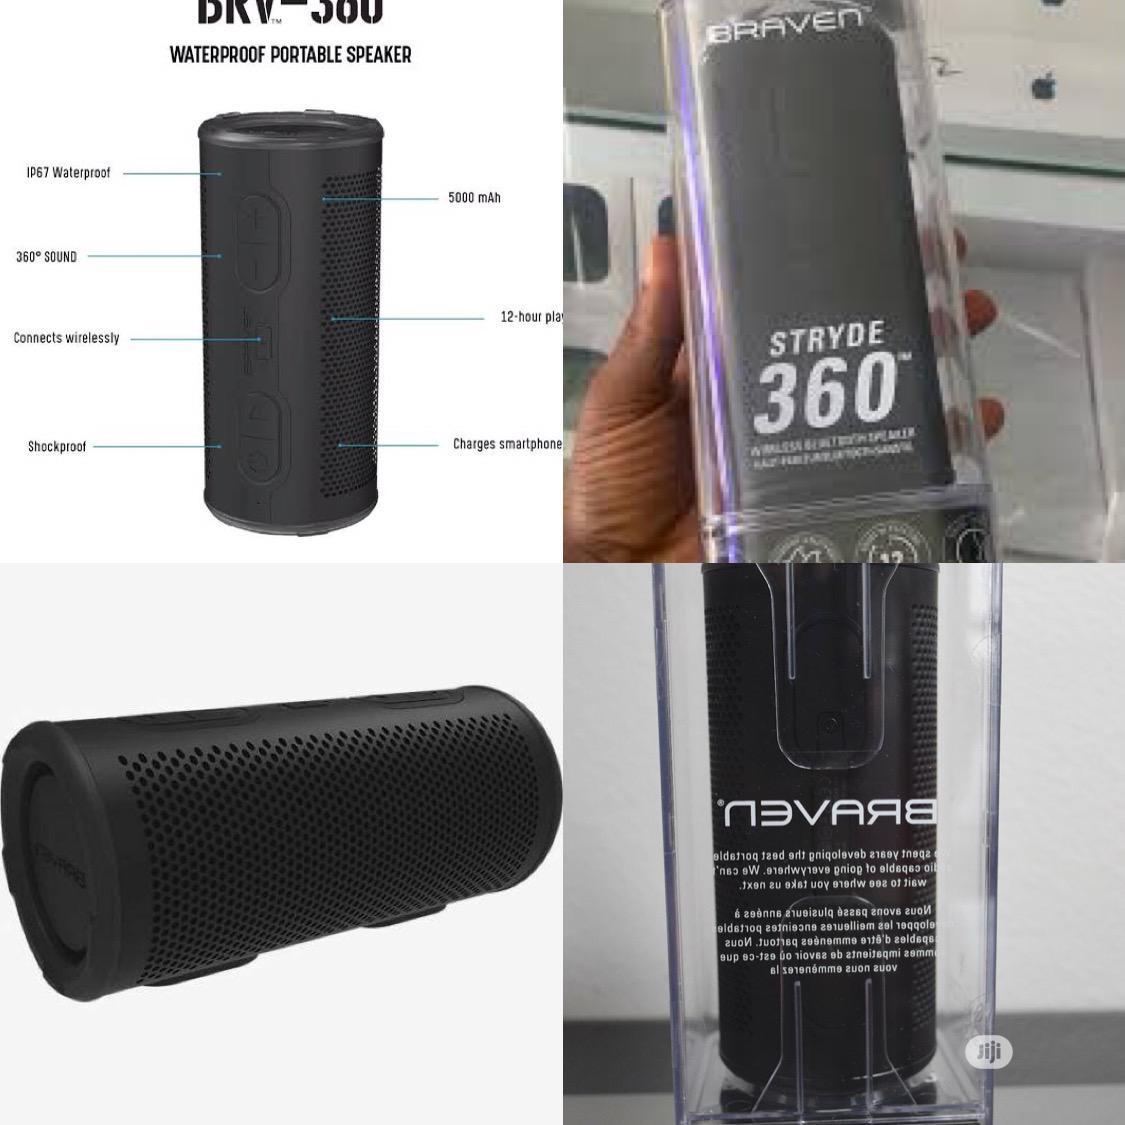 Archive: Braven Stryde 360 Degree Sound [2500 Mah] Waterproof Bluetooth Speaker